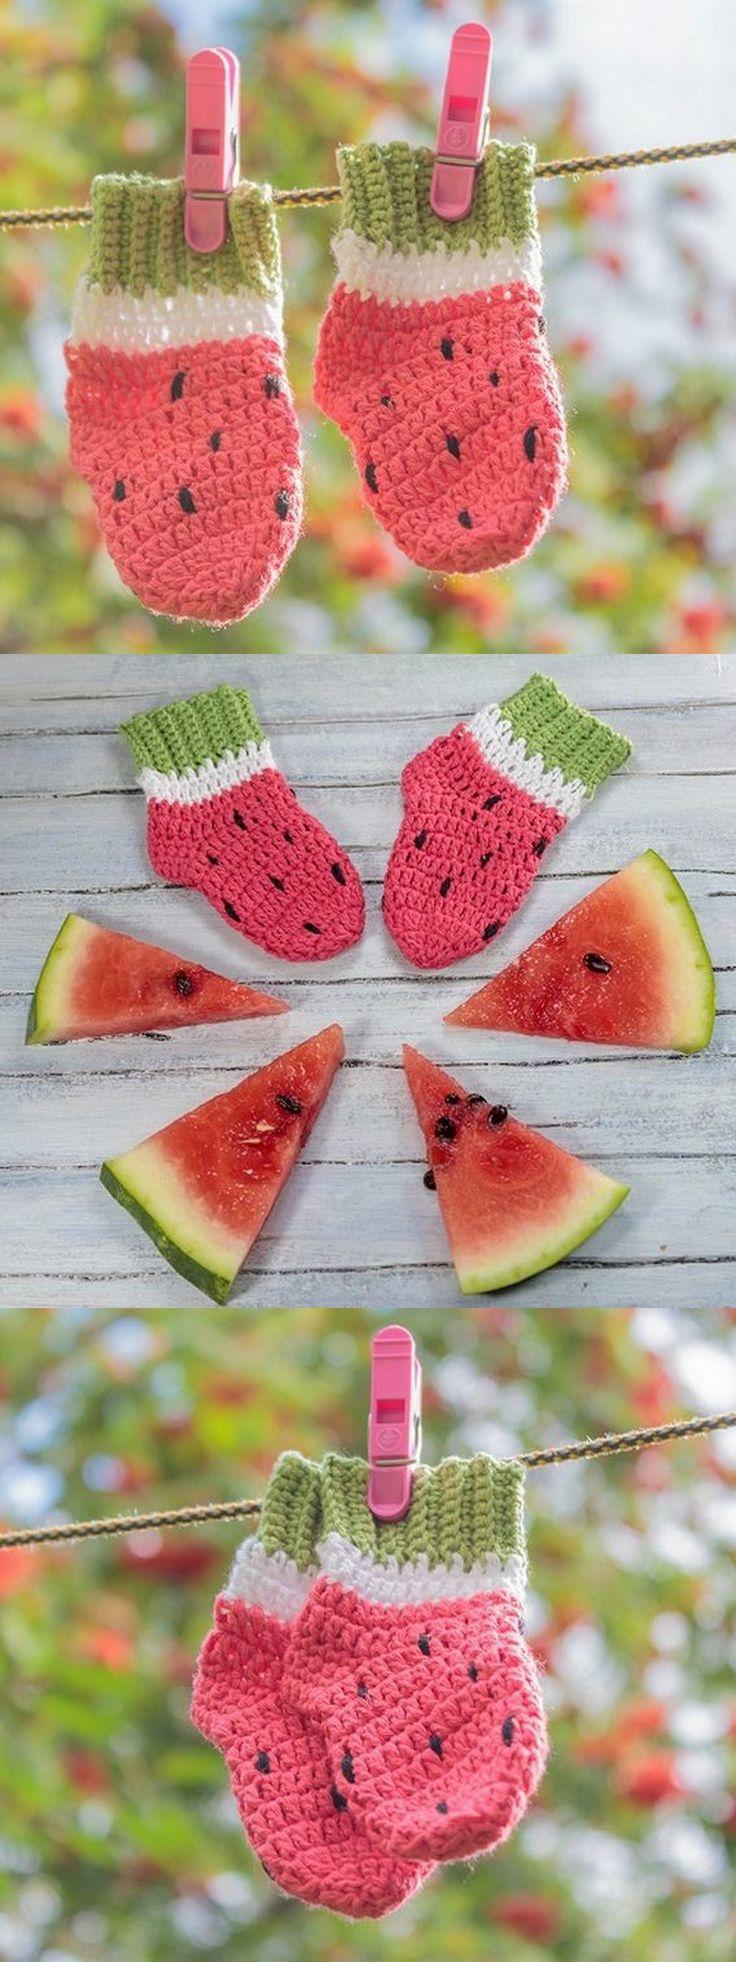 Sew ankle socks watermelon socks free pattern! Thi…